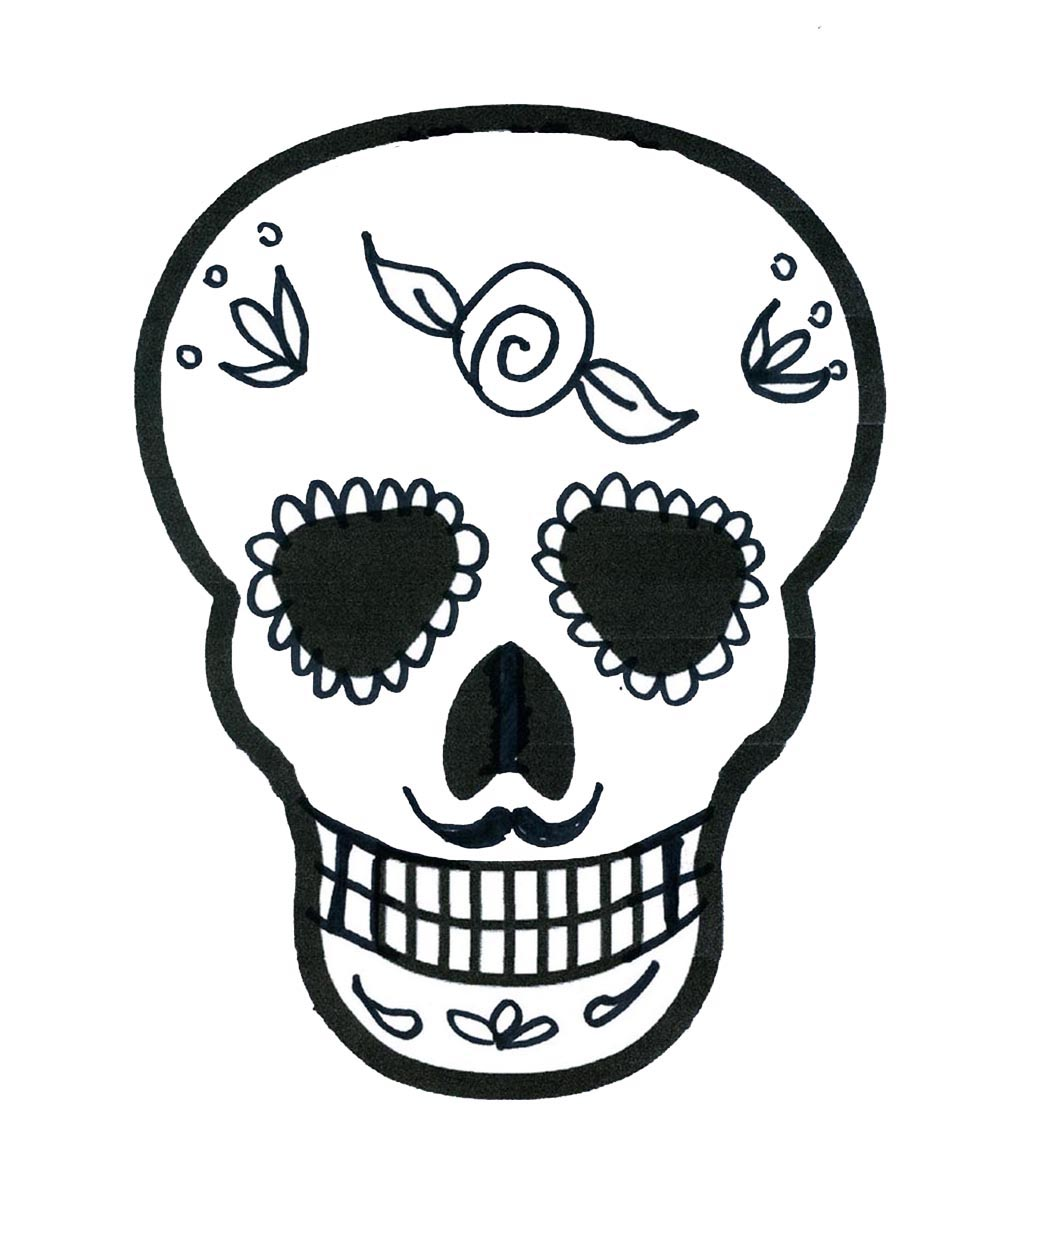 1050x1254 Drawn Sugar Skull Small Sugar